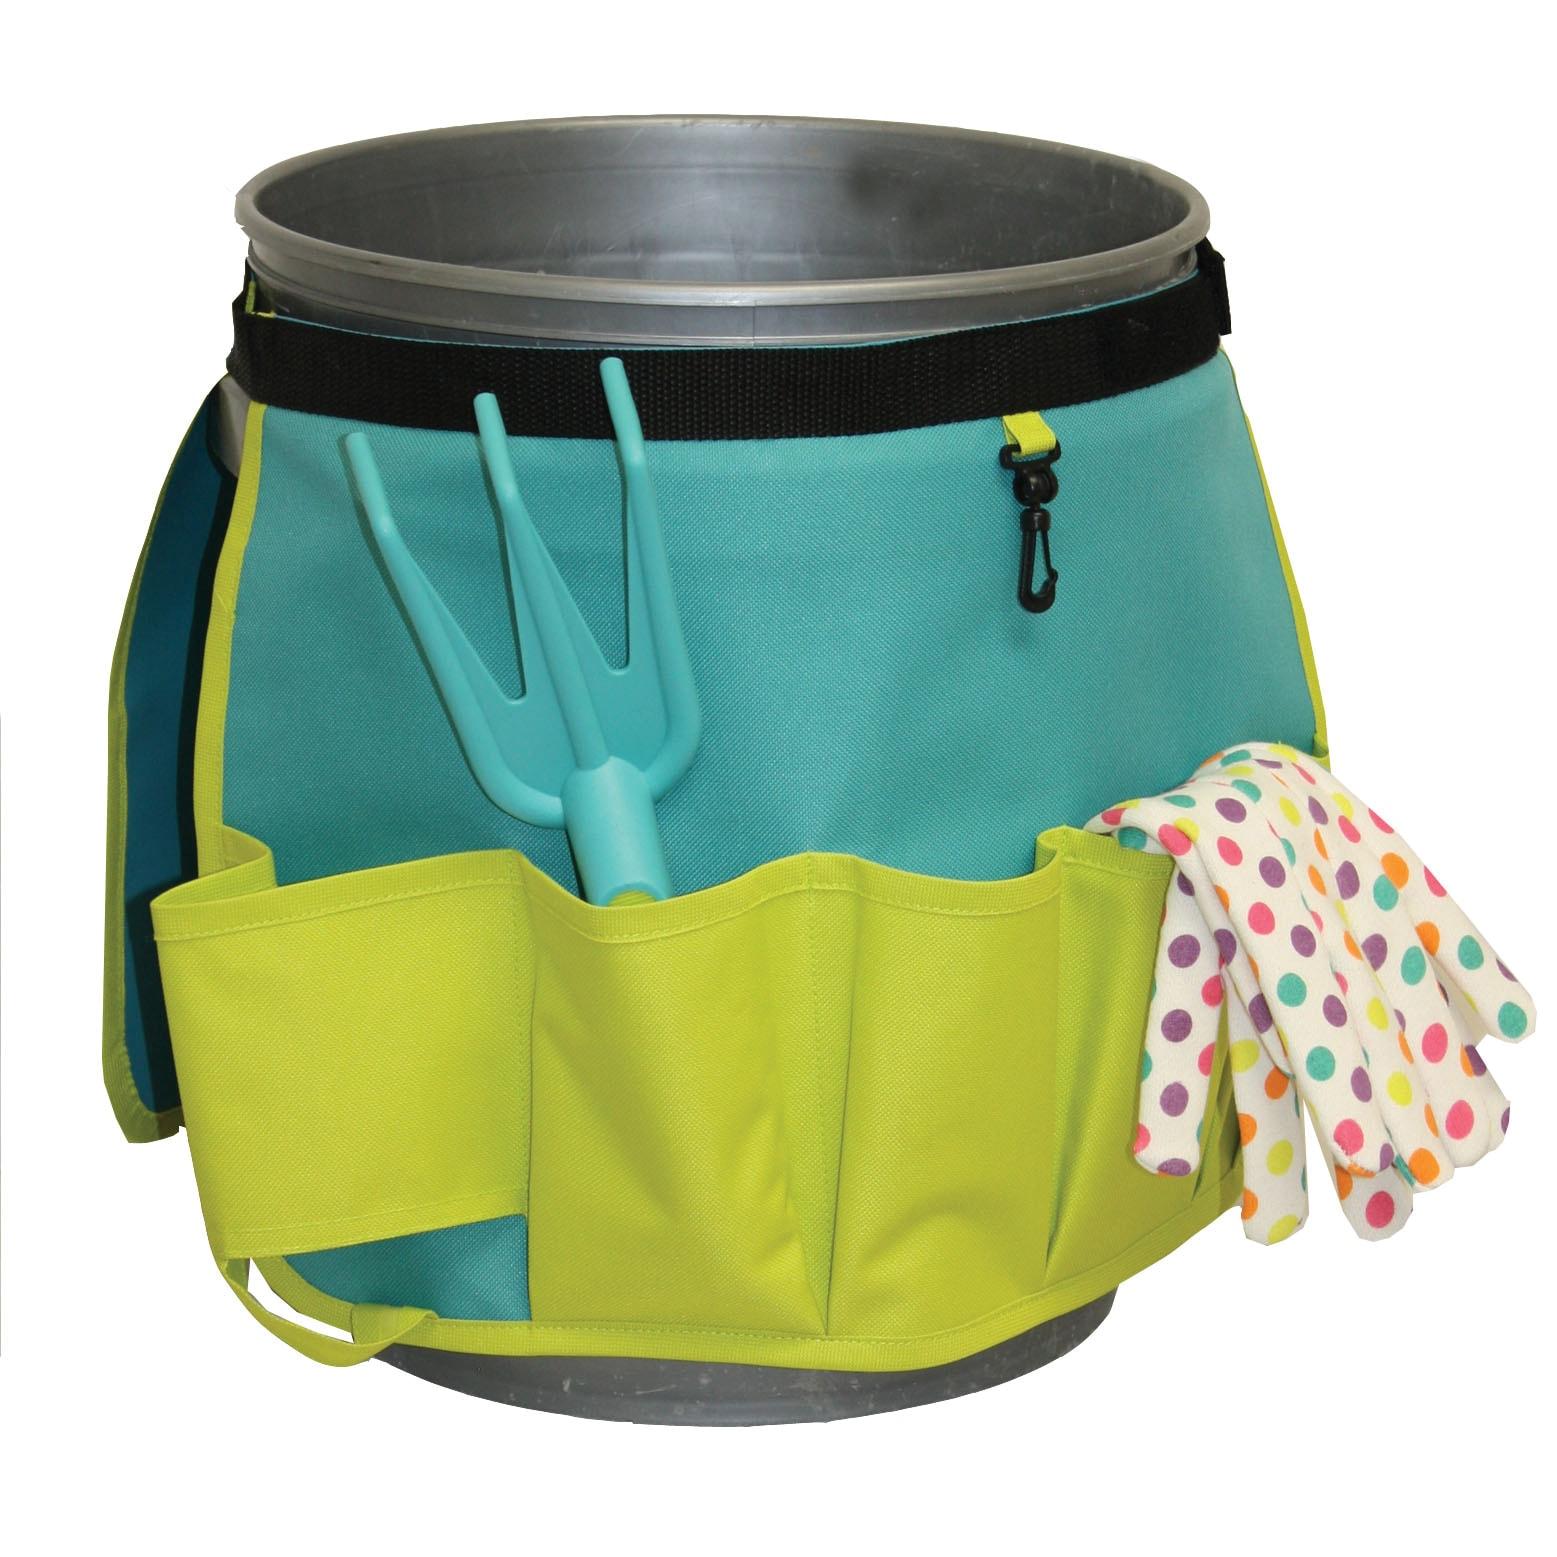 Midwest Glove 56D4 5 Gallon Bucket Organizer (Bucket Orga...